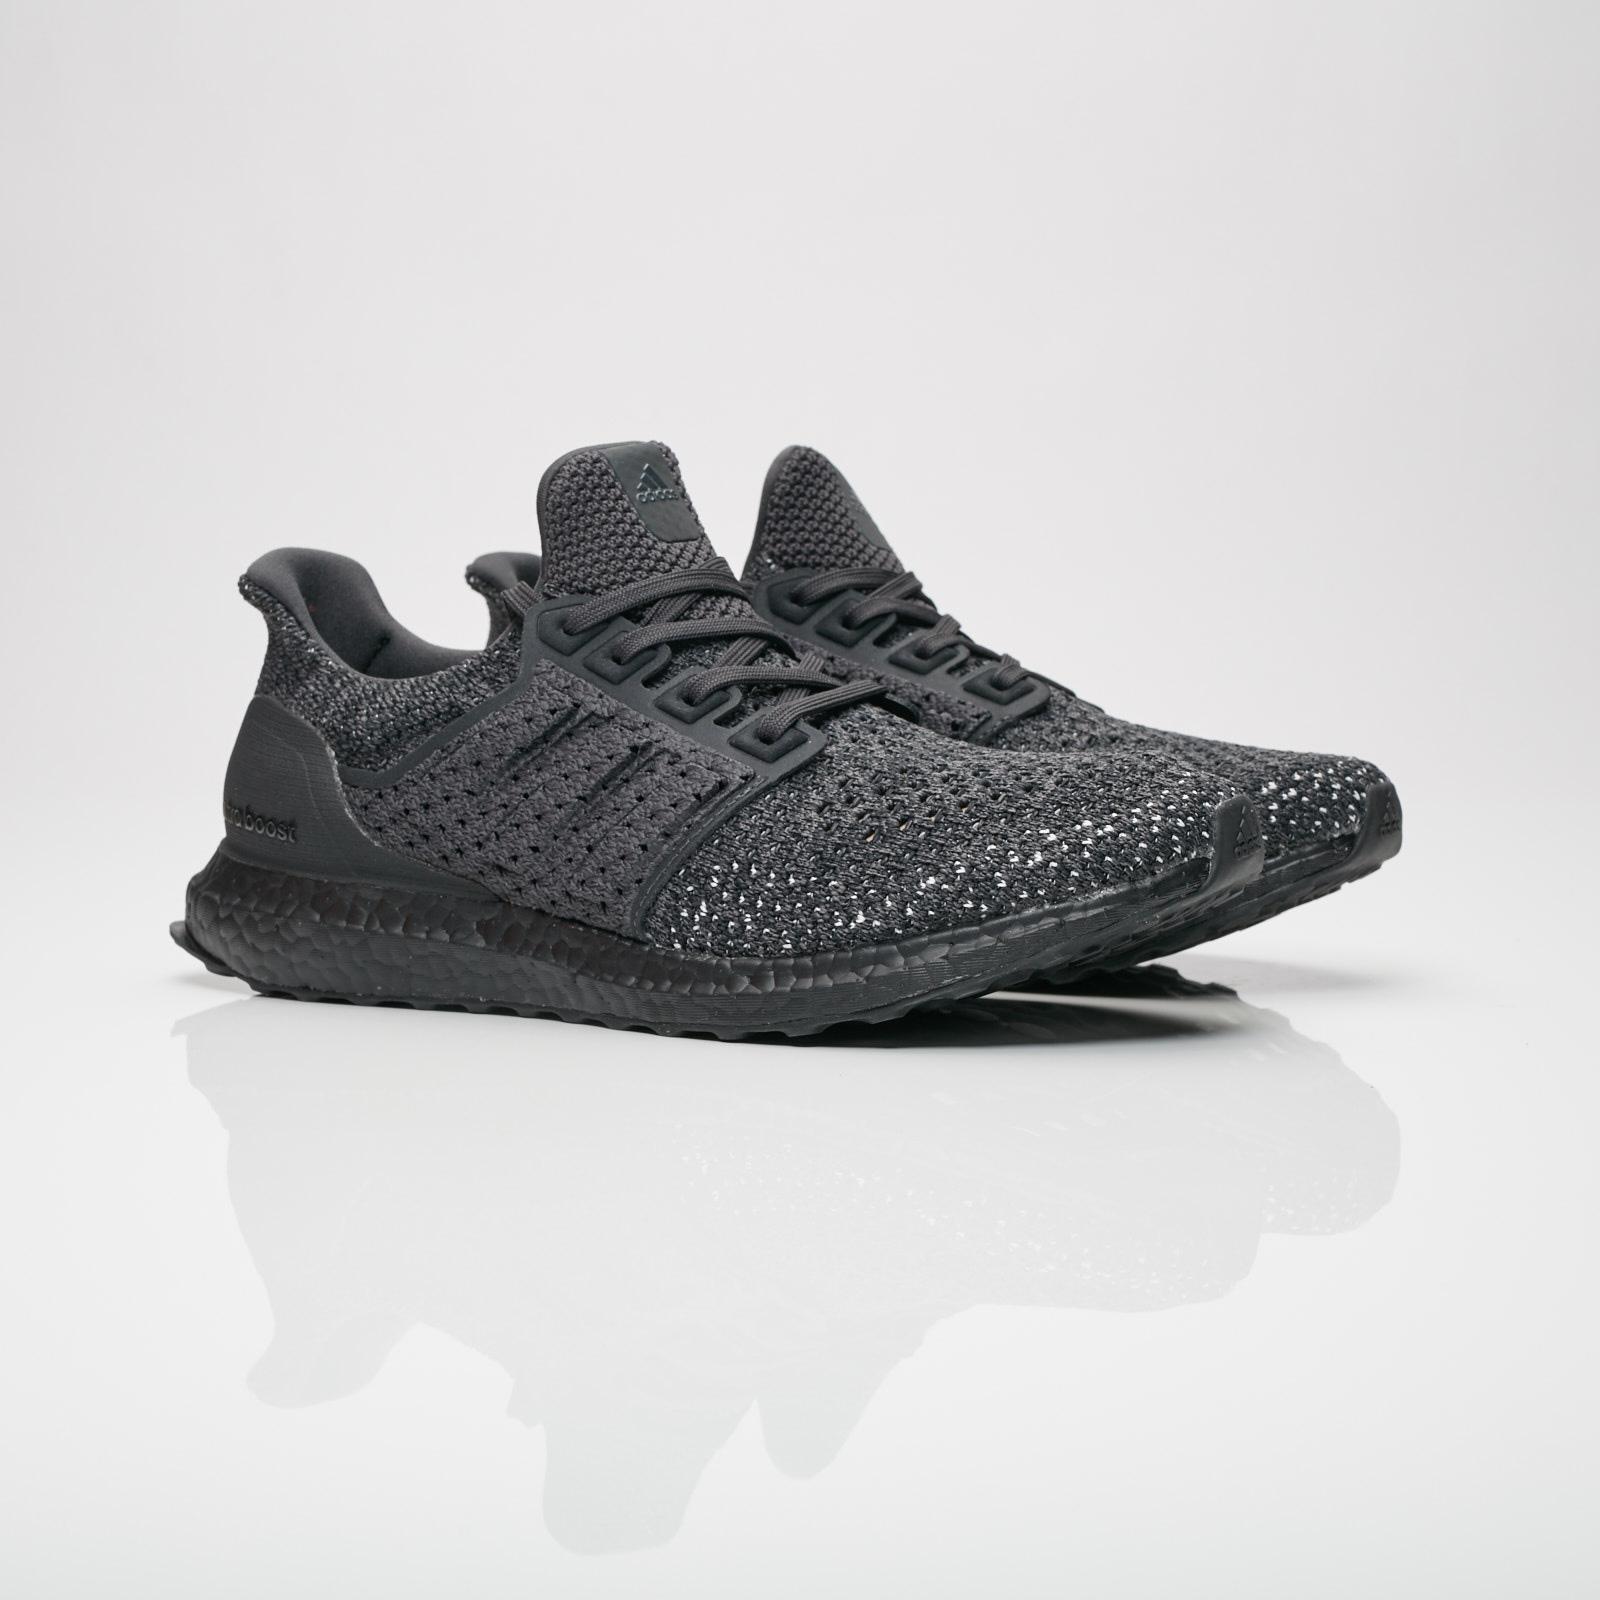 043df52fbe2aa adidas UltraBOOST CLIMA - Cq0022 - Sneakersnstuff | sneakers ...